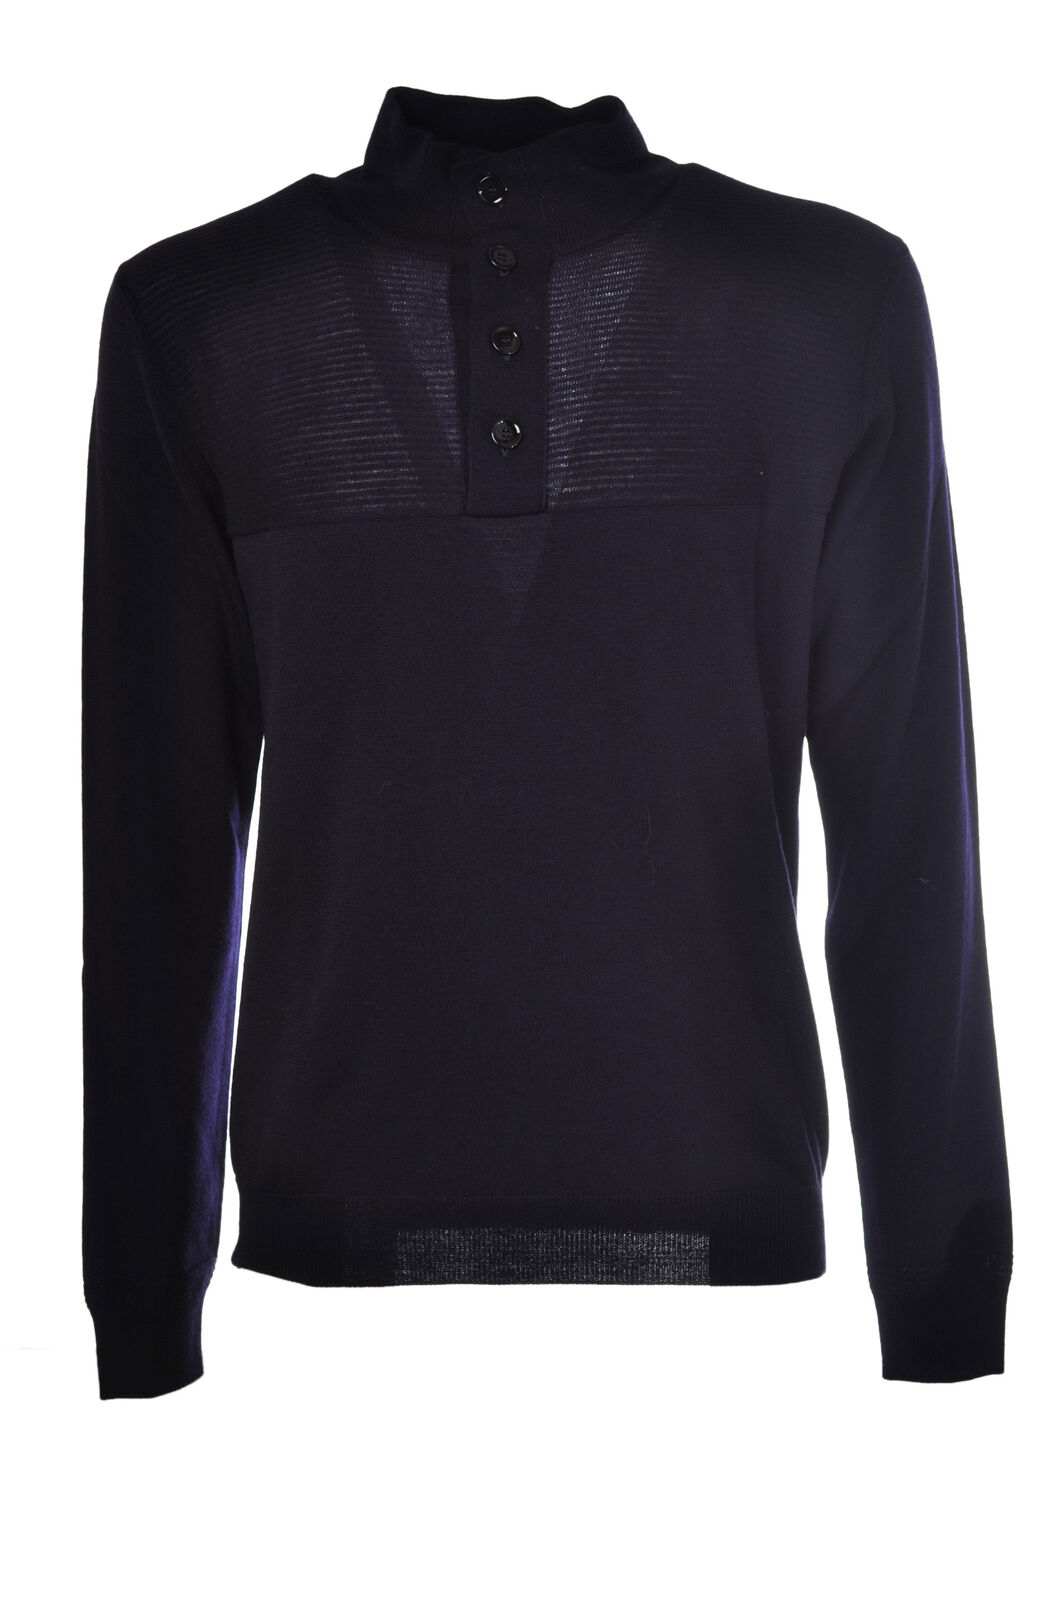 Paolo Pecora  -  Sweaters - Male - Blau - 2782730N174007